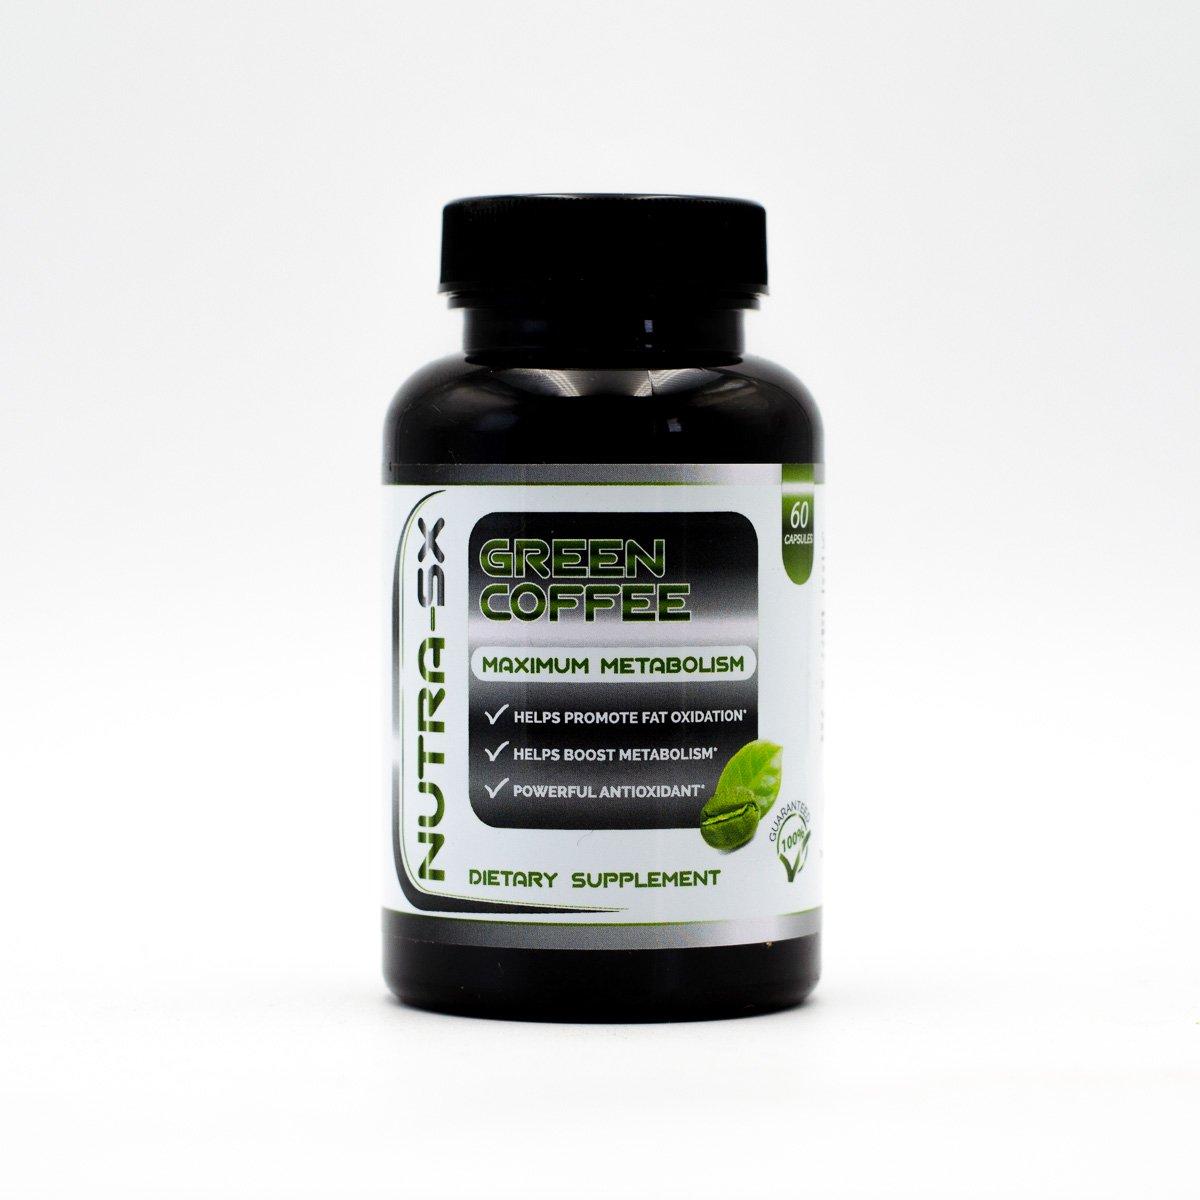 Nutra SX- Green Coffee- Maximum Metabolism- Helps Promote Fat Oxidation- Helps Boost Metabolism-Powerful Anti-Oxidant